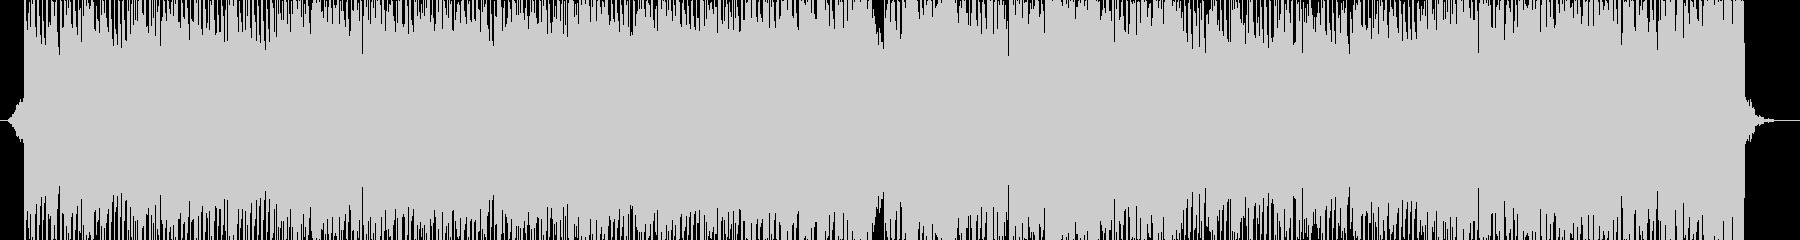 8bitが入ったfuture bassの未再生の波形